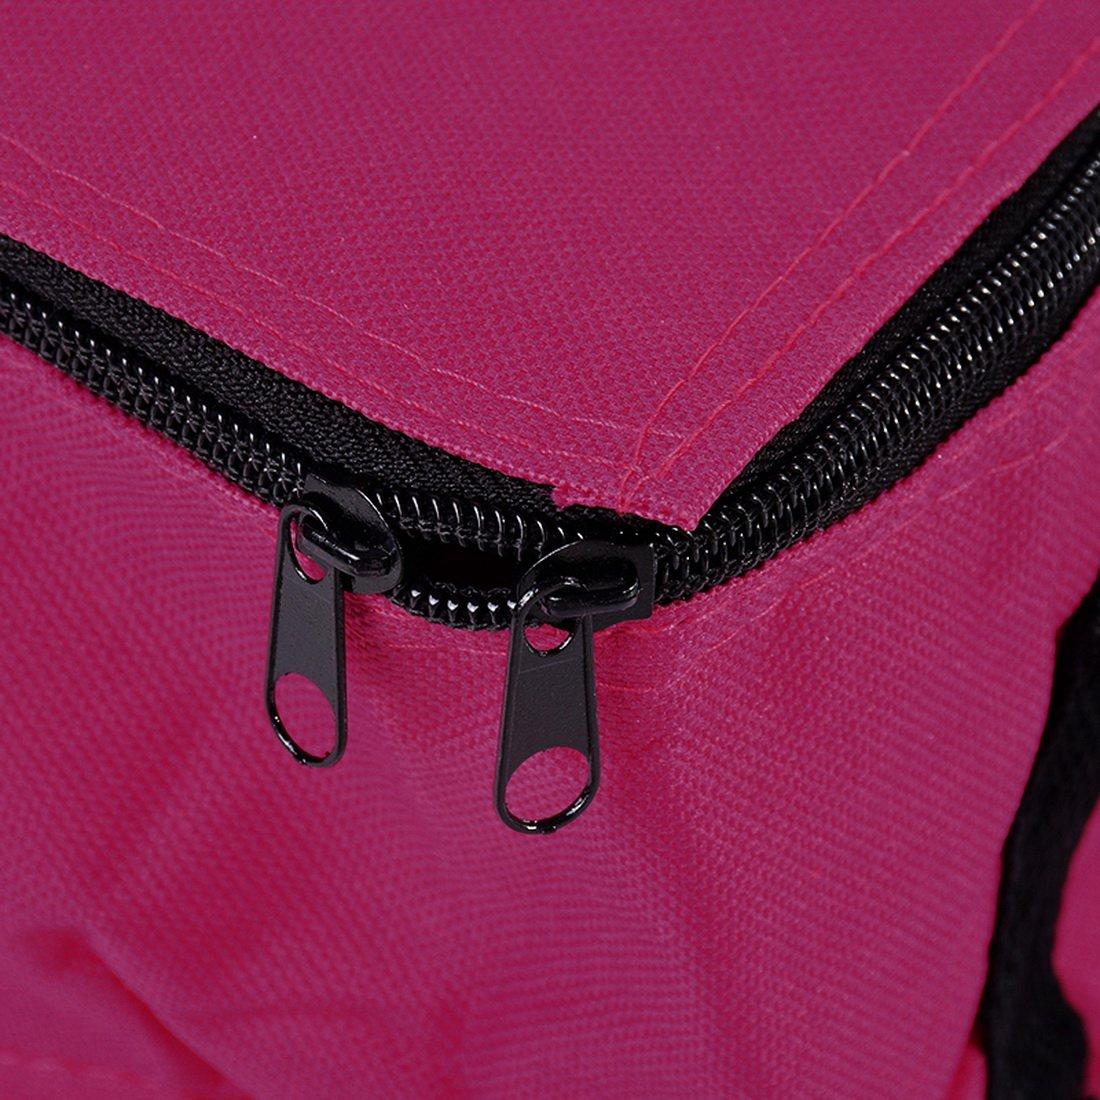 sexyguys Rose Sfit Sac Repas Isotherme Lunch Bag Portable Pliable pour Famille de Voyage Barbecue Camping Pique-nique